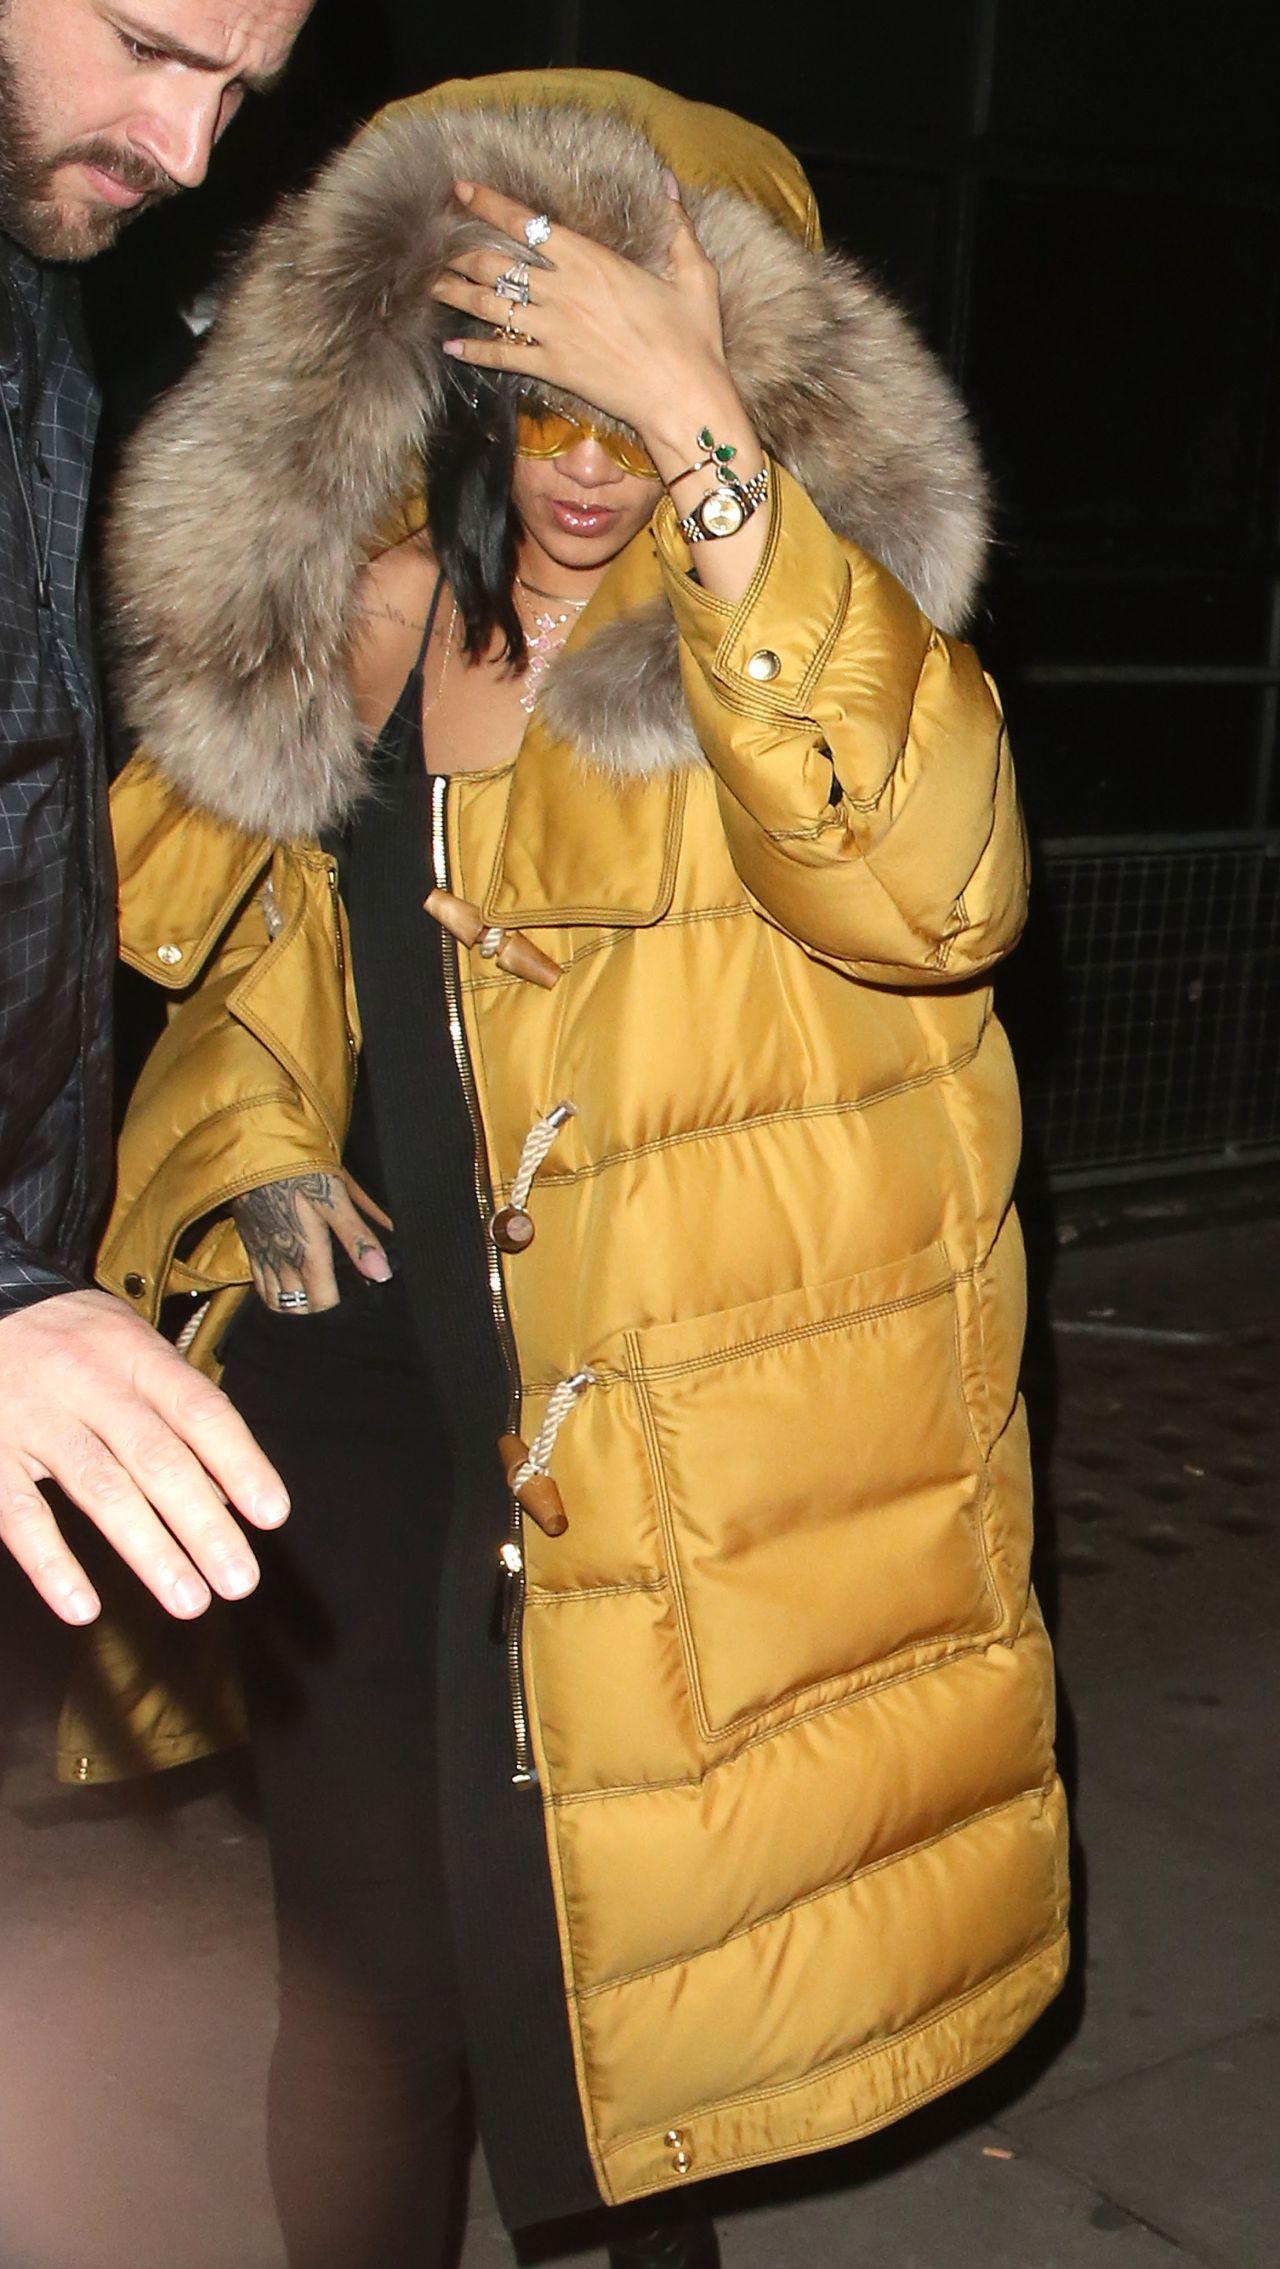 Rihanna libertine nightclub in london uk 2 22 2016